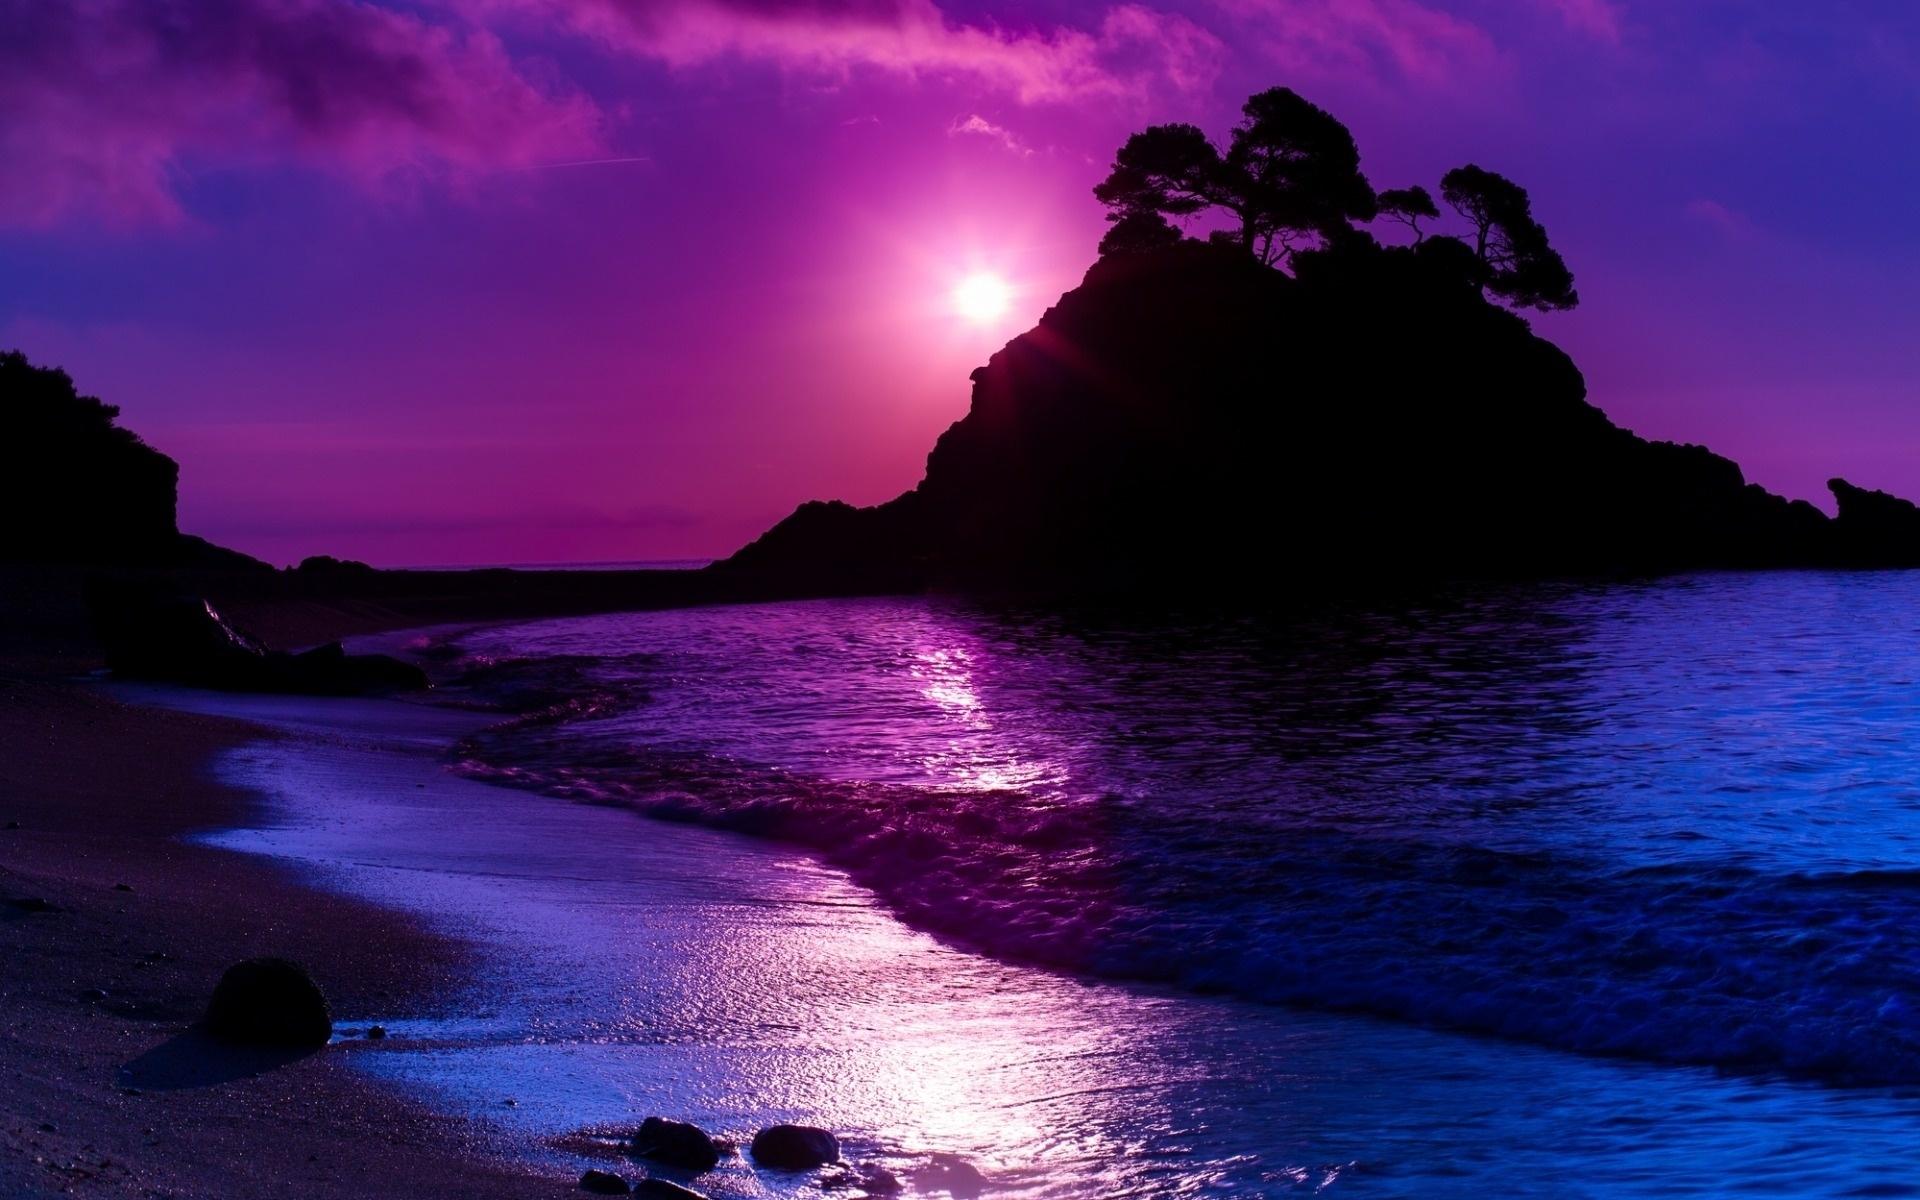 Purple Ocean Sunset HD Wallpaper | Background Image | 1920x1200 - Wallpaper  Abyss